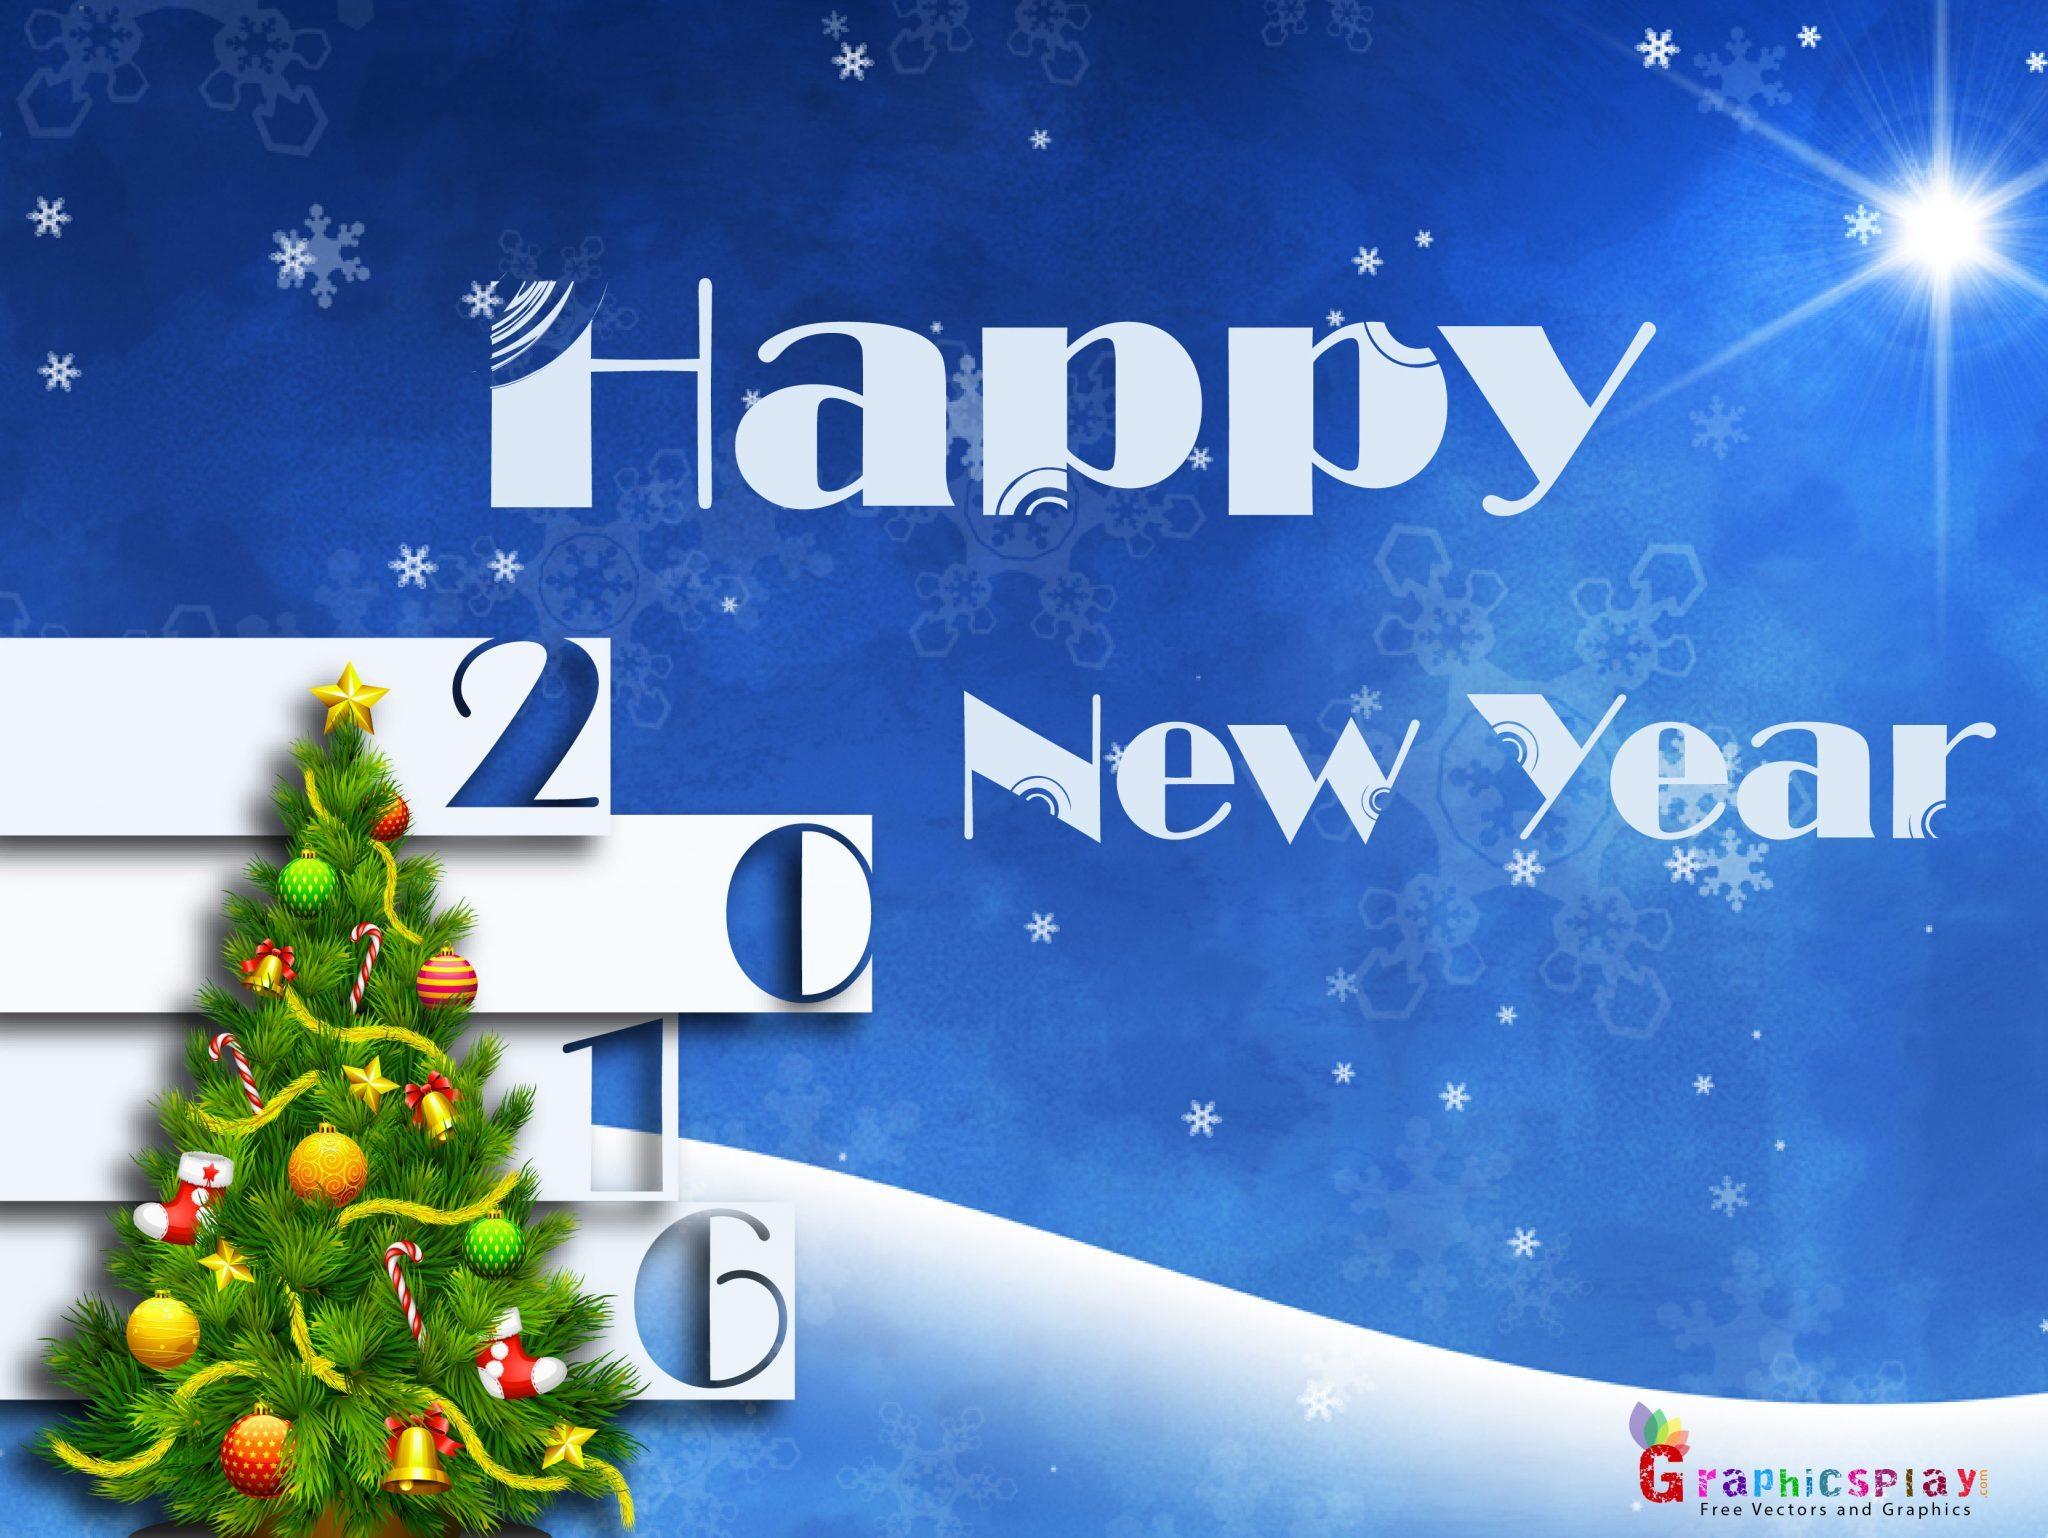 Happy New Year Greeting 2016 4